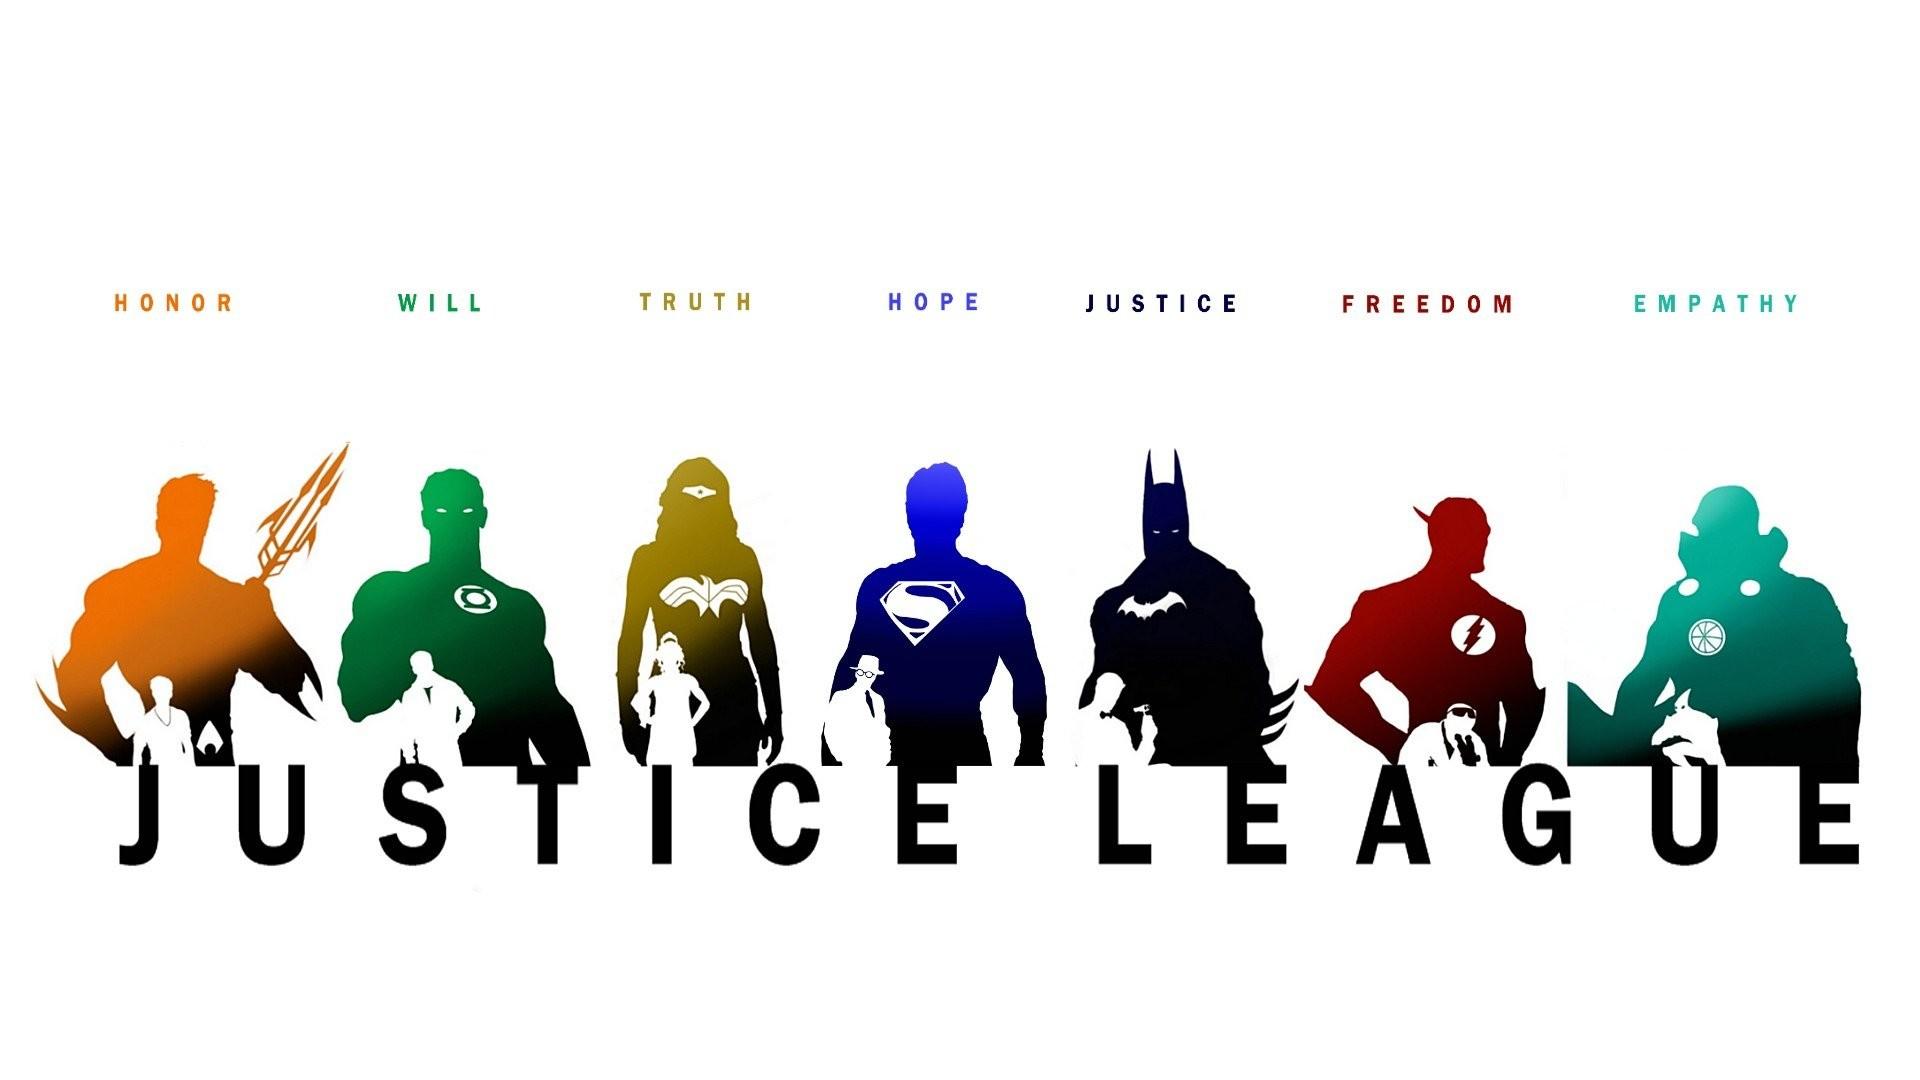 Res: 1920x1080, Wonder Woman, Flash, Green Lantern, Aquaman, Martian Manhunter, DC Comics,